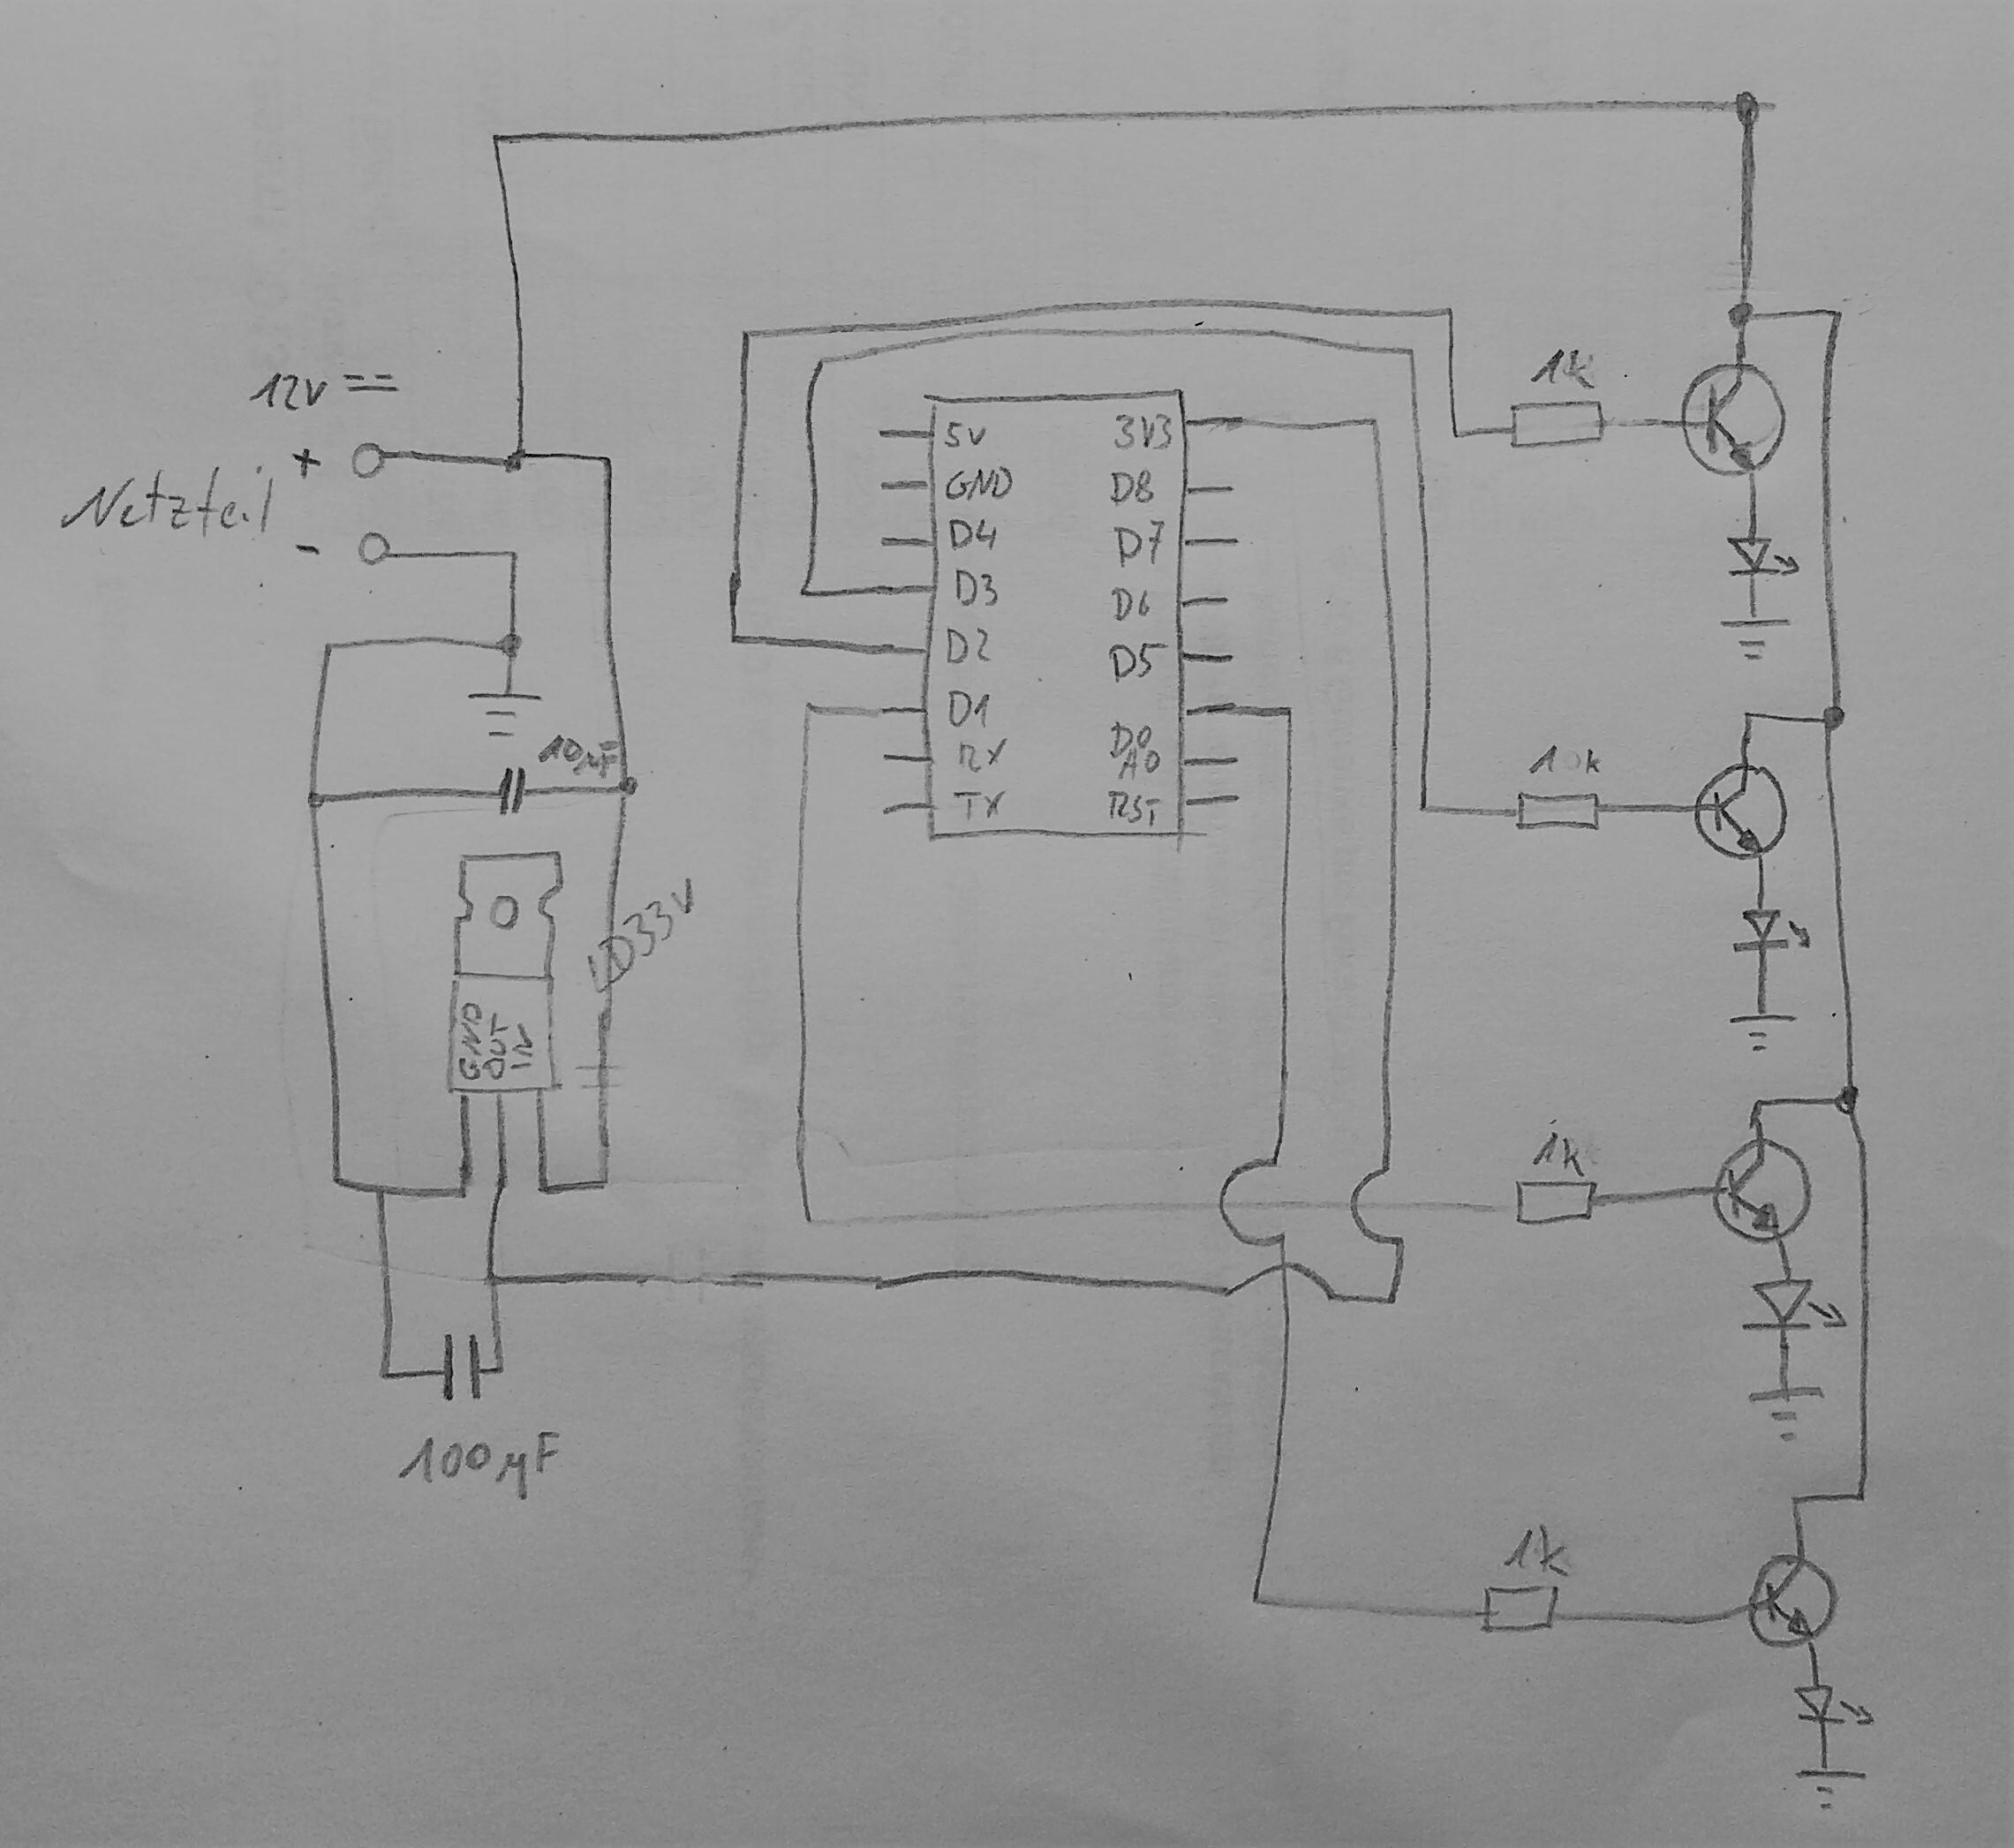 fehlersuche steuerplatine rgbw led strips per esp8266. Black Bedroom Furniture Sets. Home Design Ideas